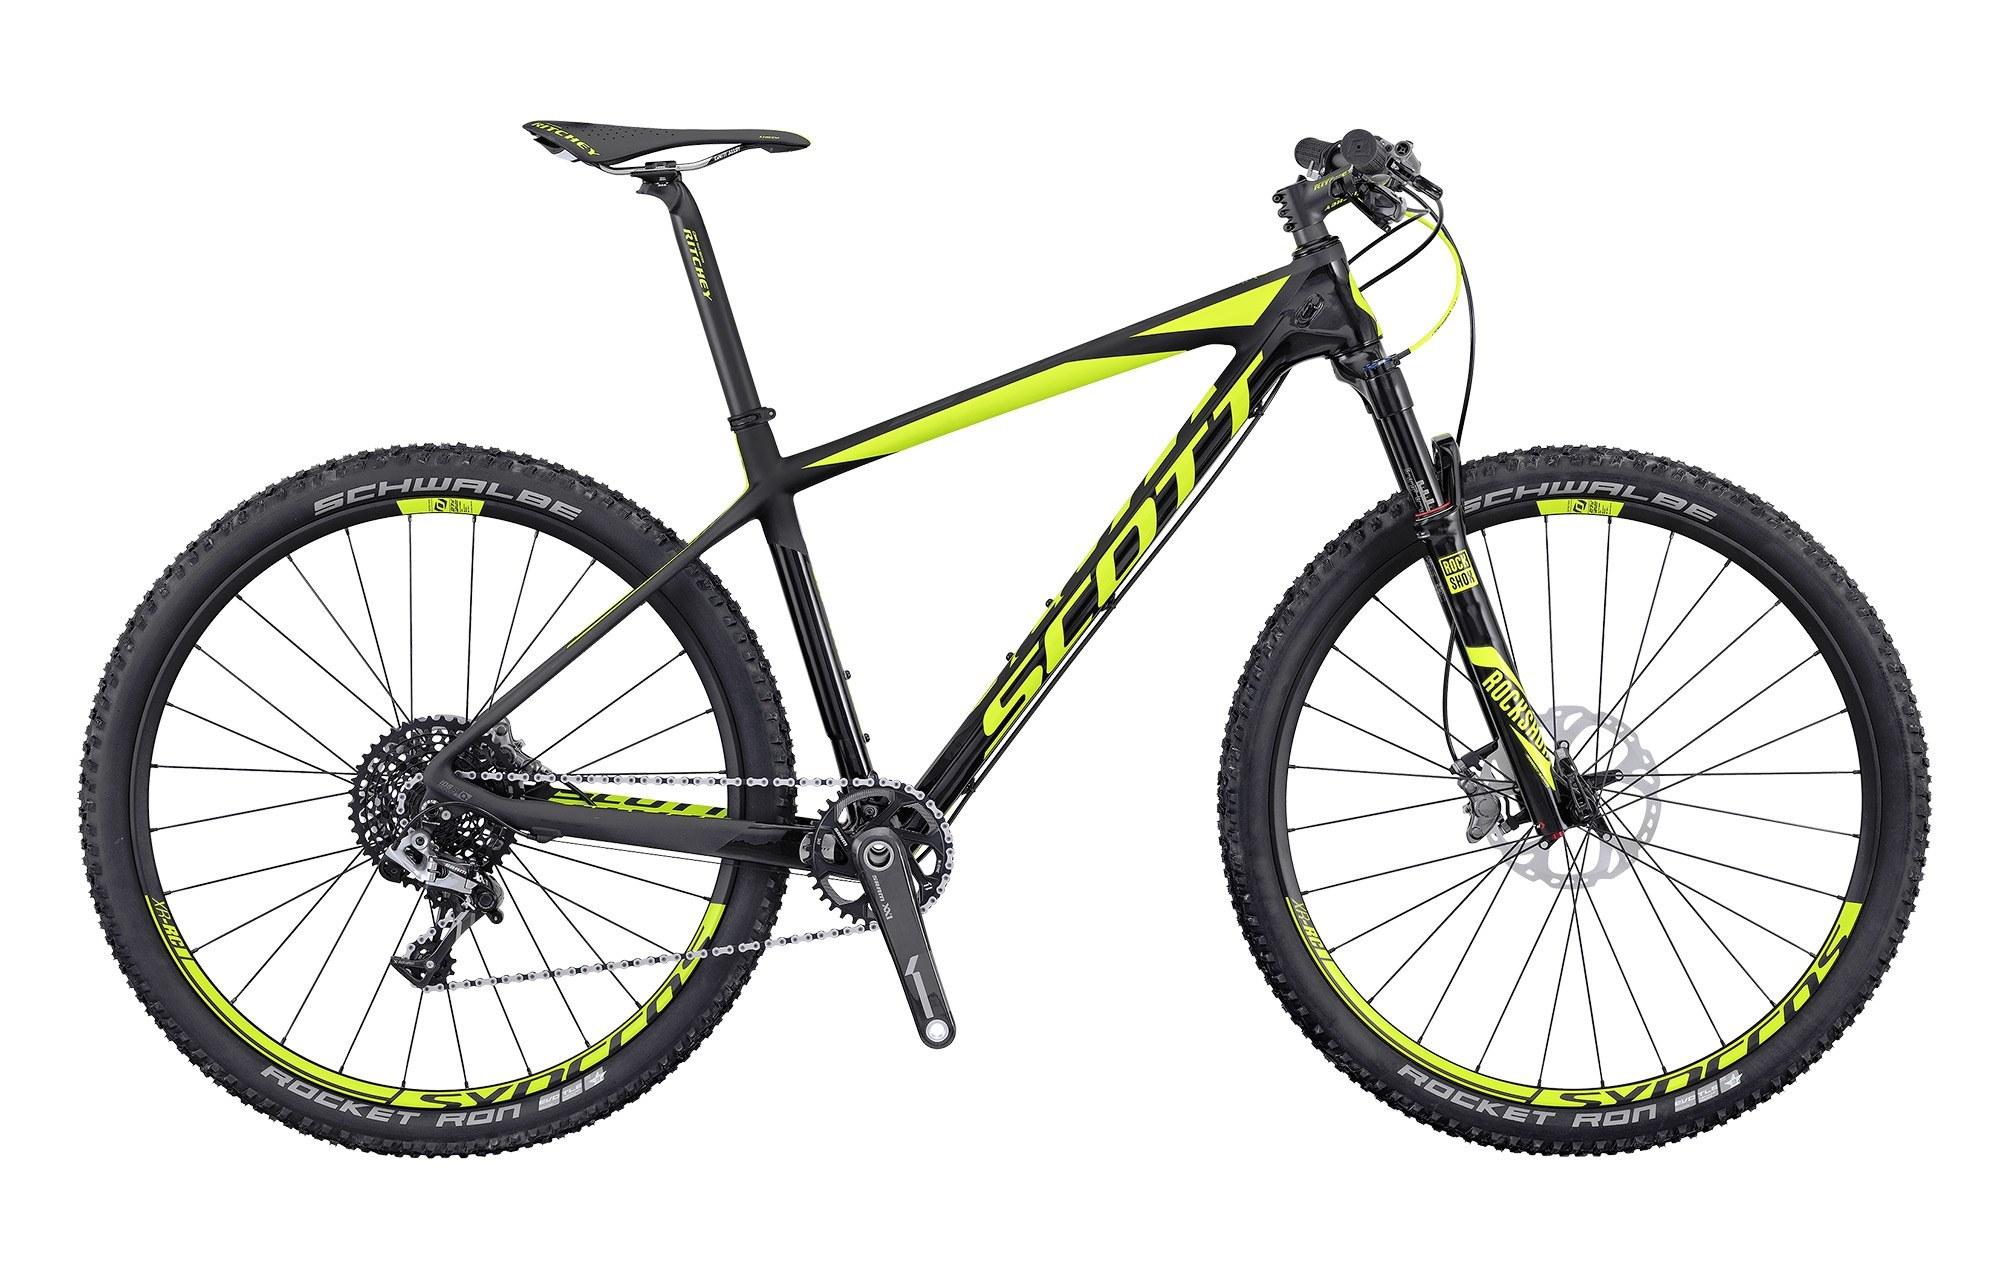 2016 Scott Scale 700 RC Bike 8de076d70